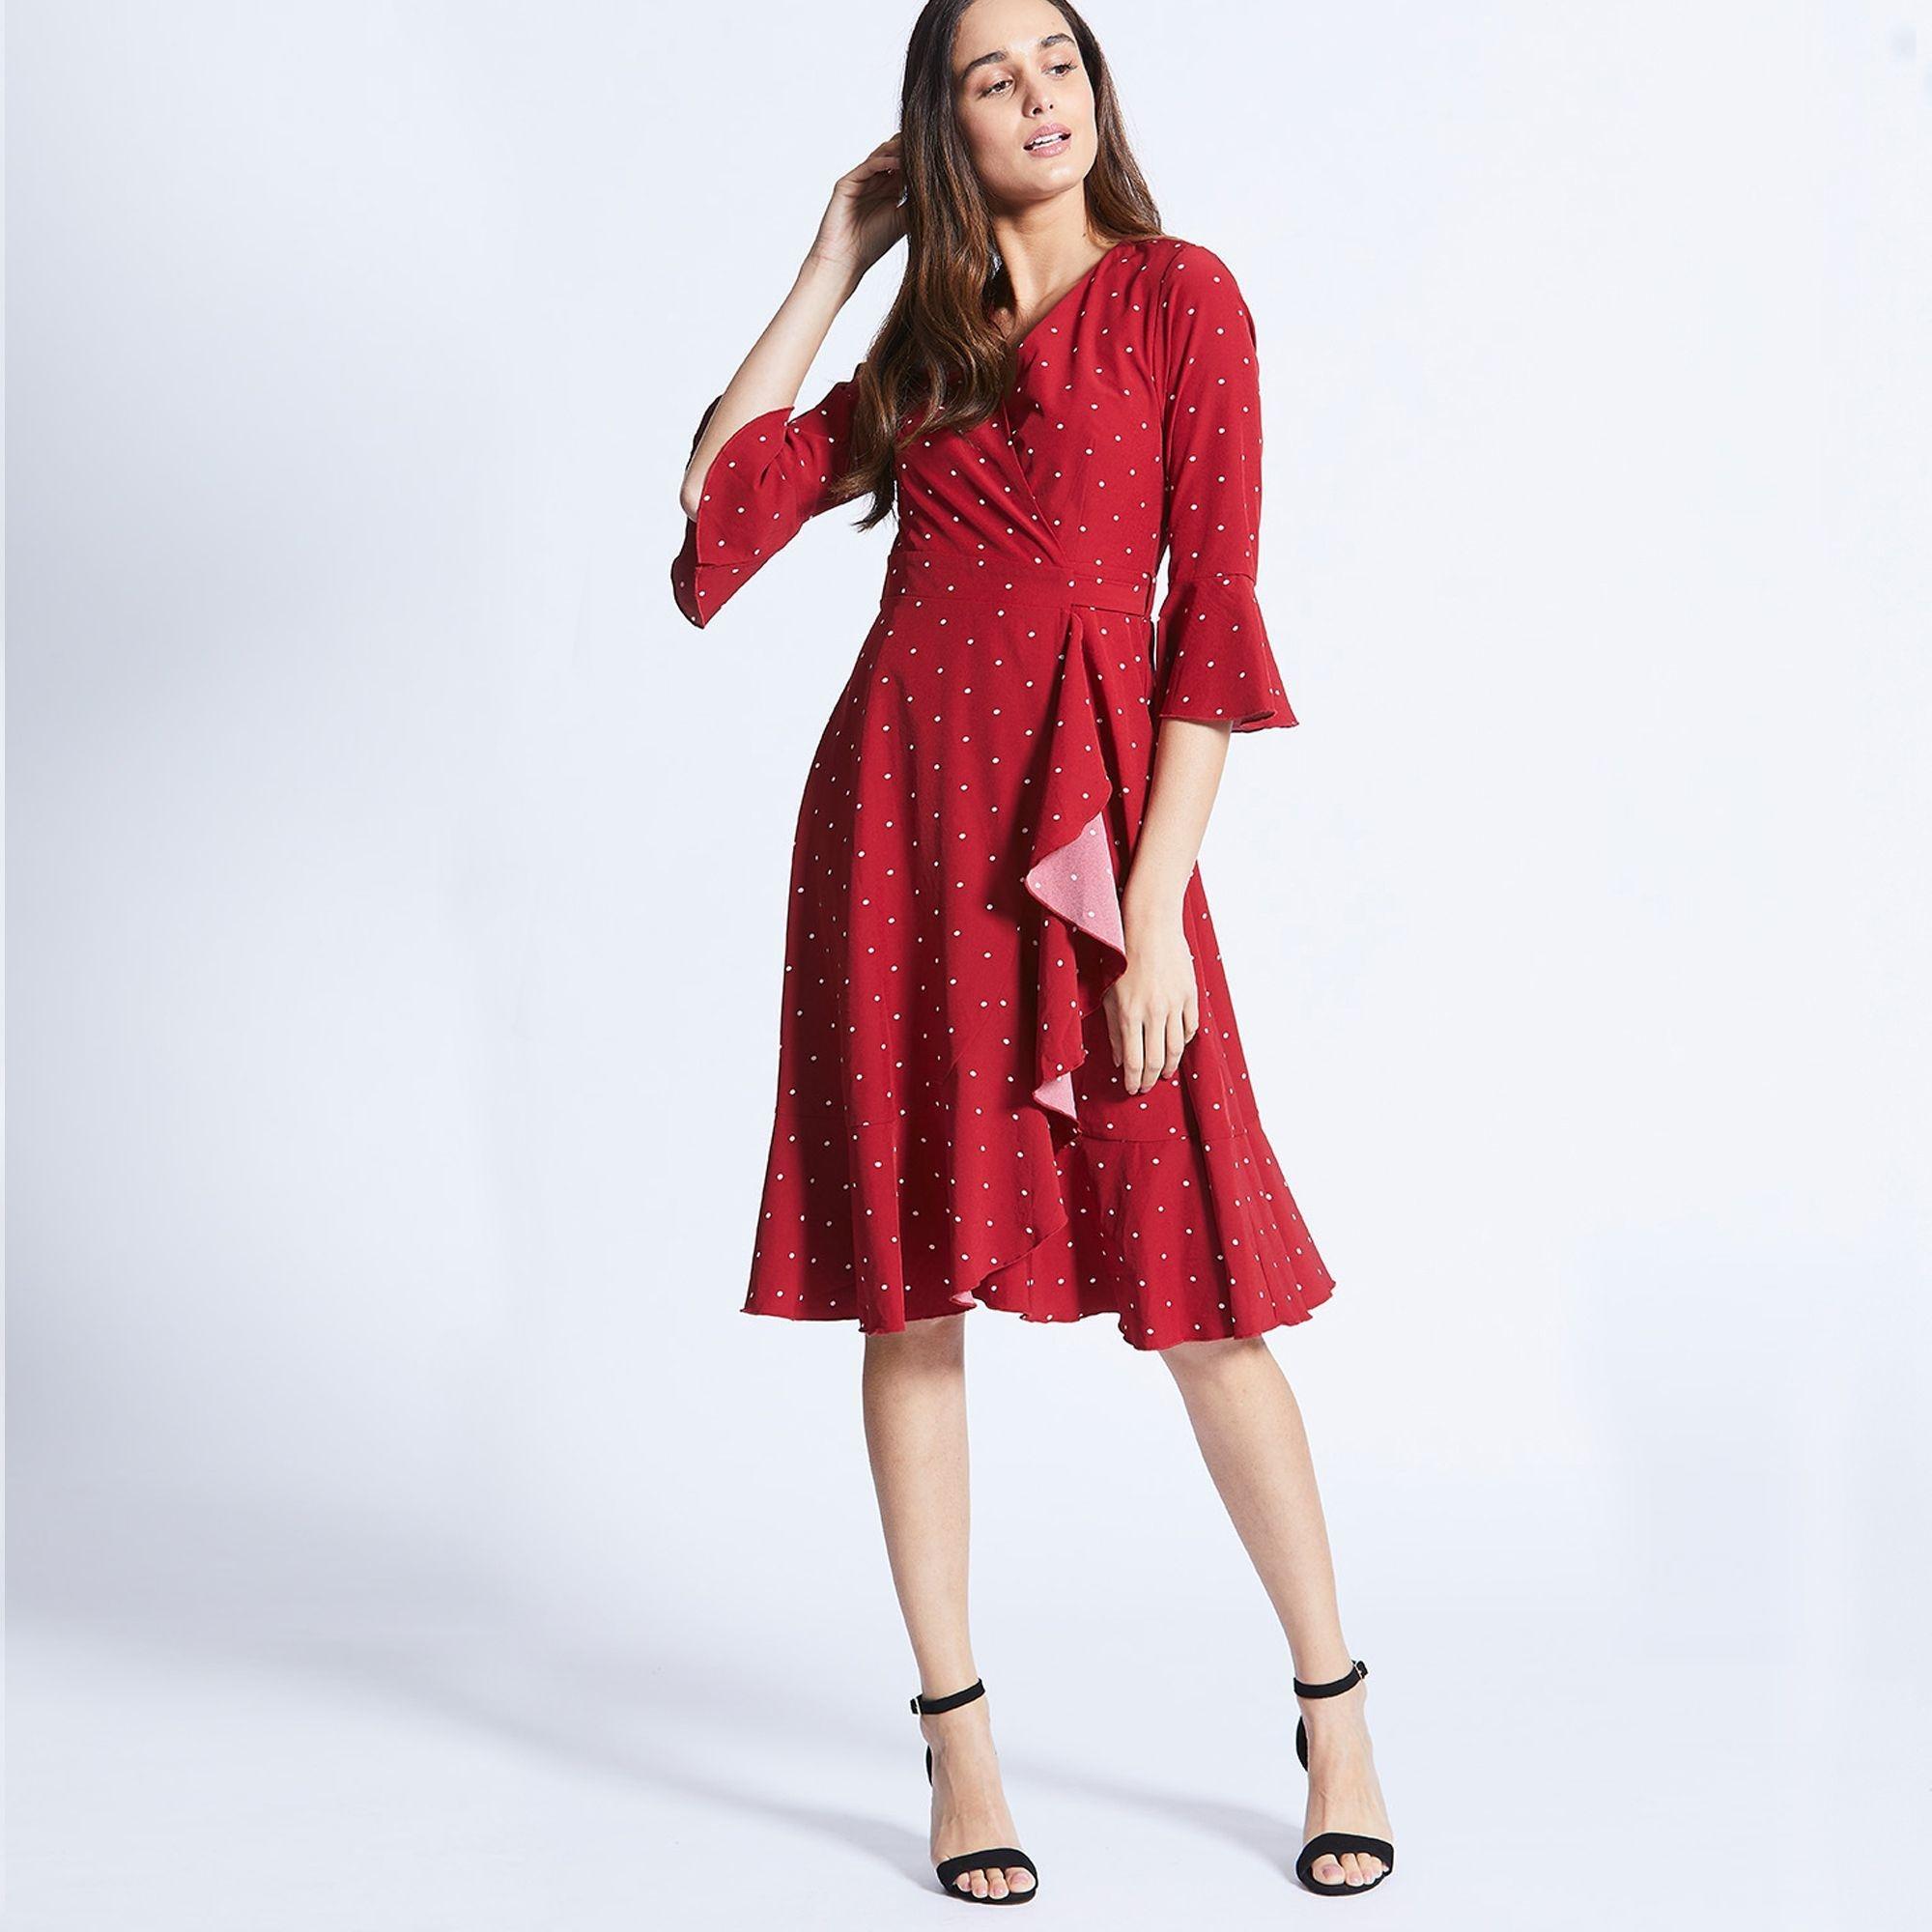 f2700da1c9072b Angeleye Red Ruffle Polka Dot Midi Dress in Red - Lyst